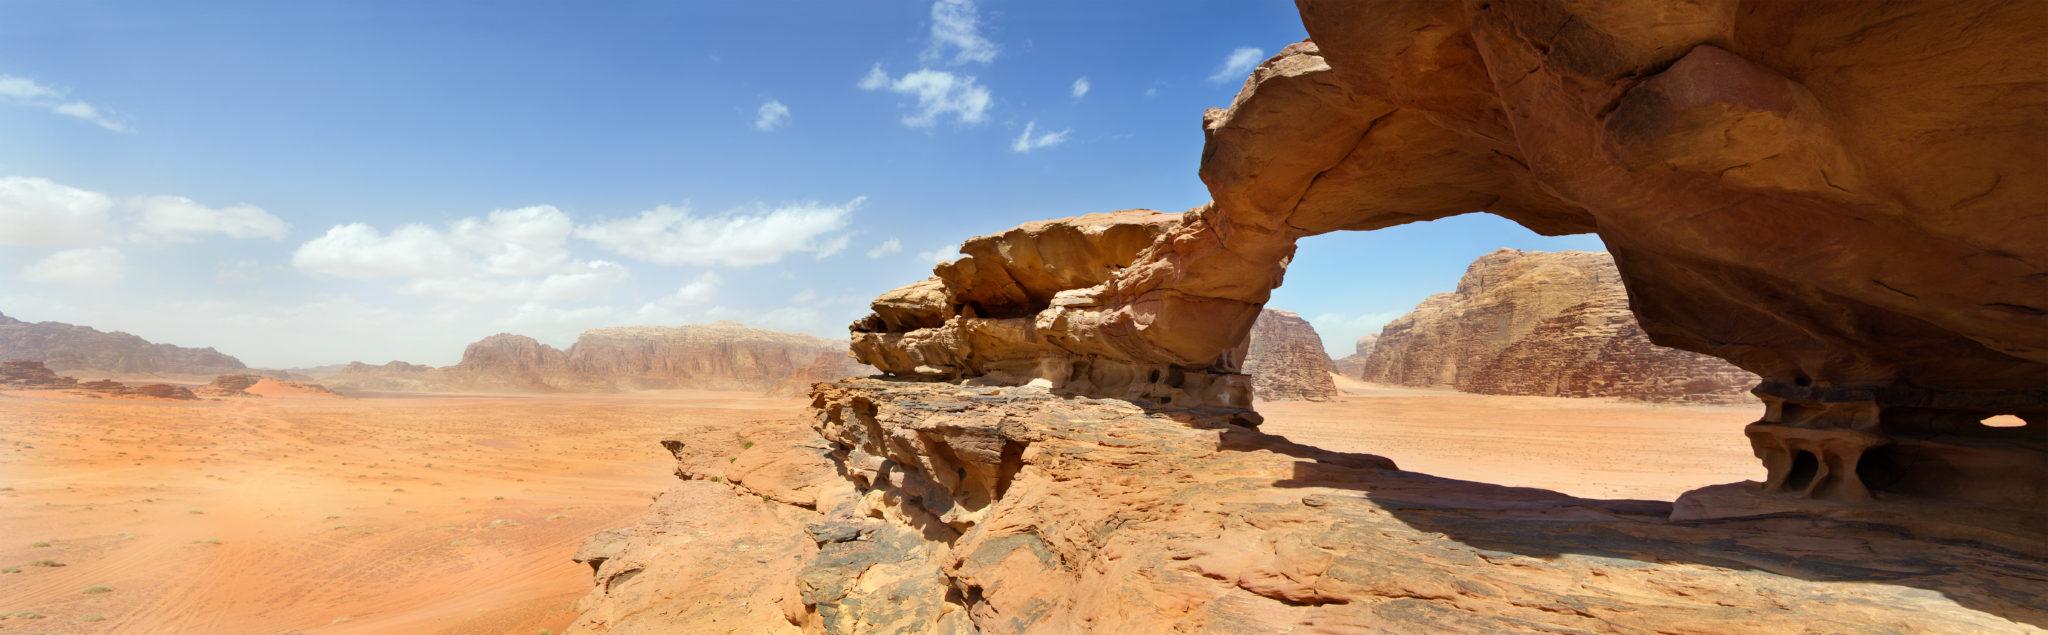 pustynia Wadi Rum Jordania